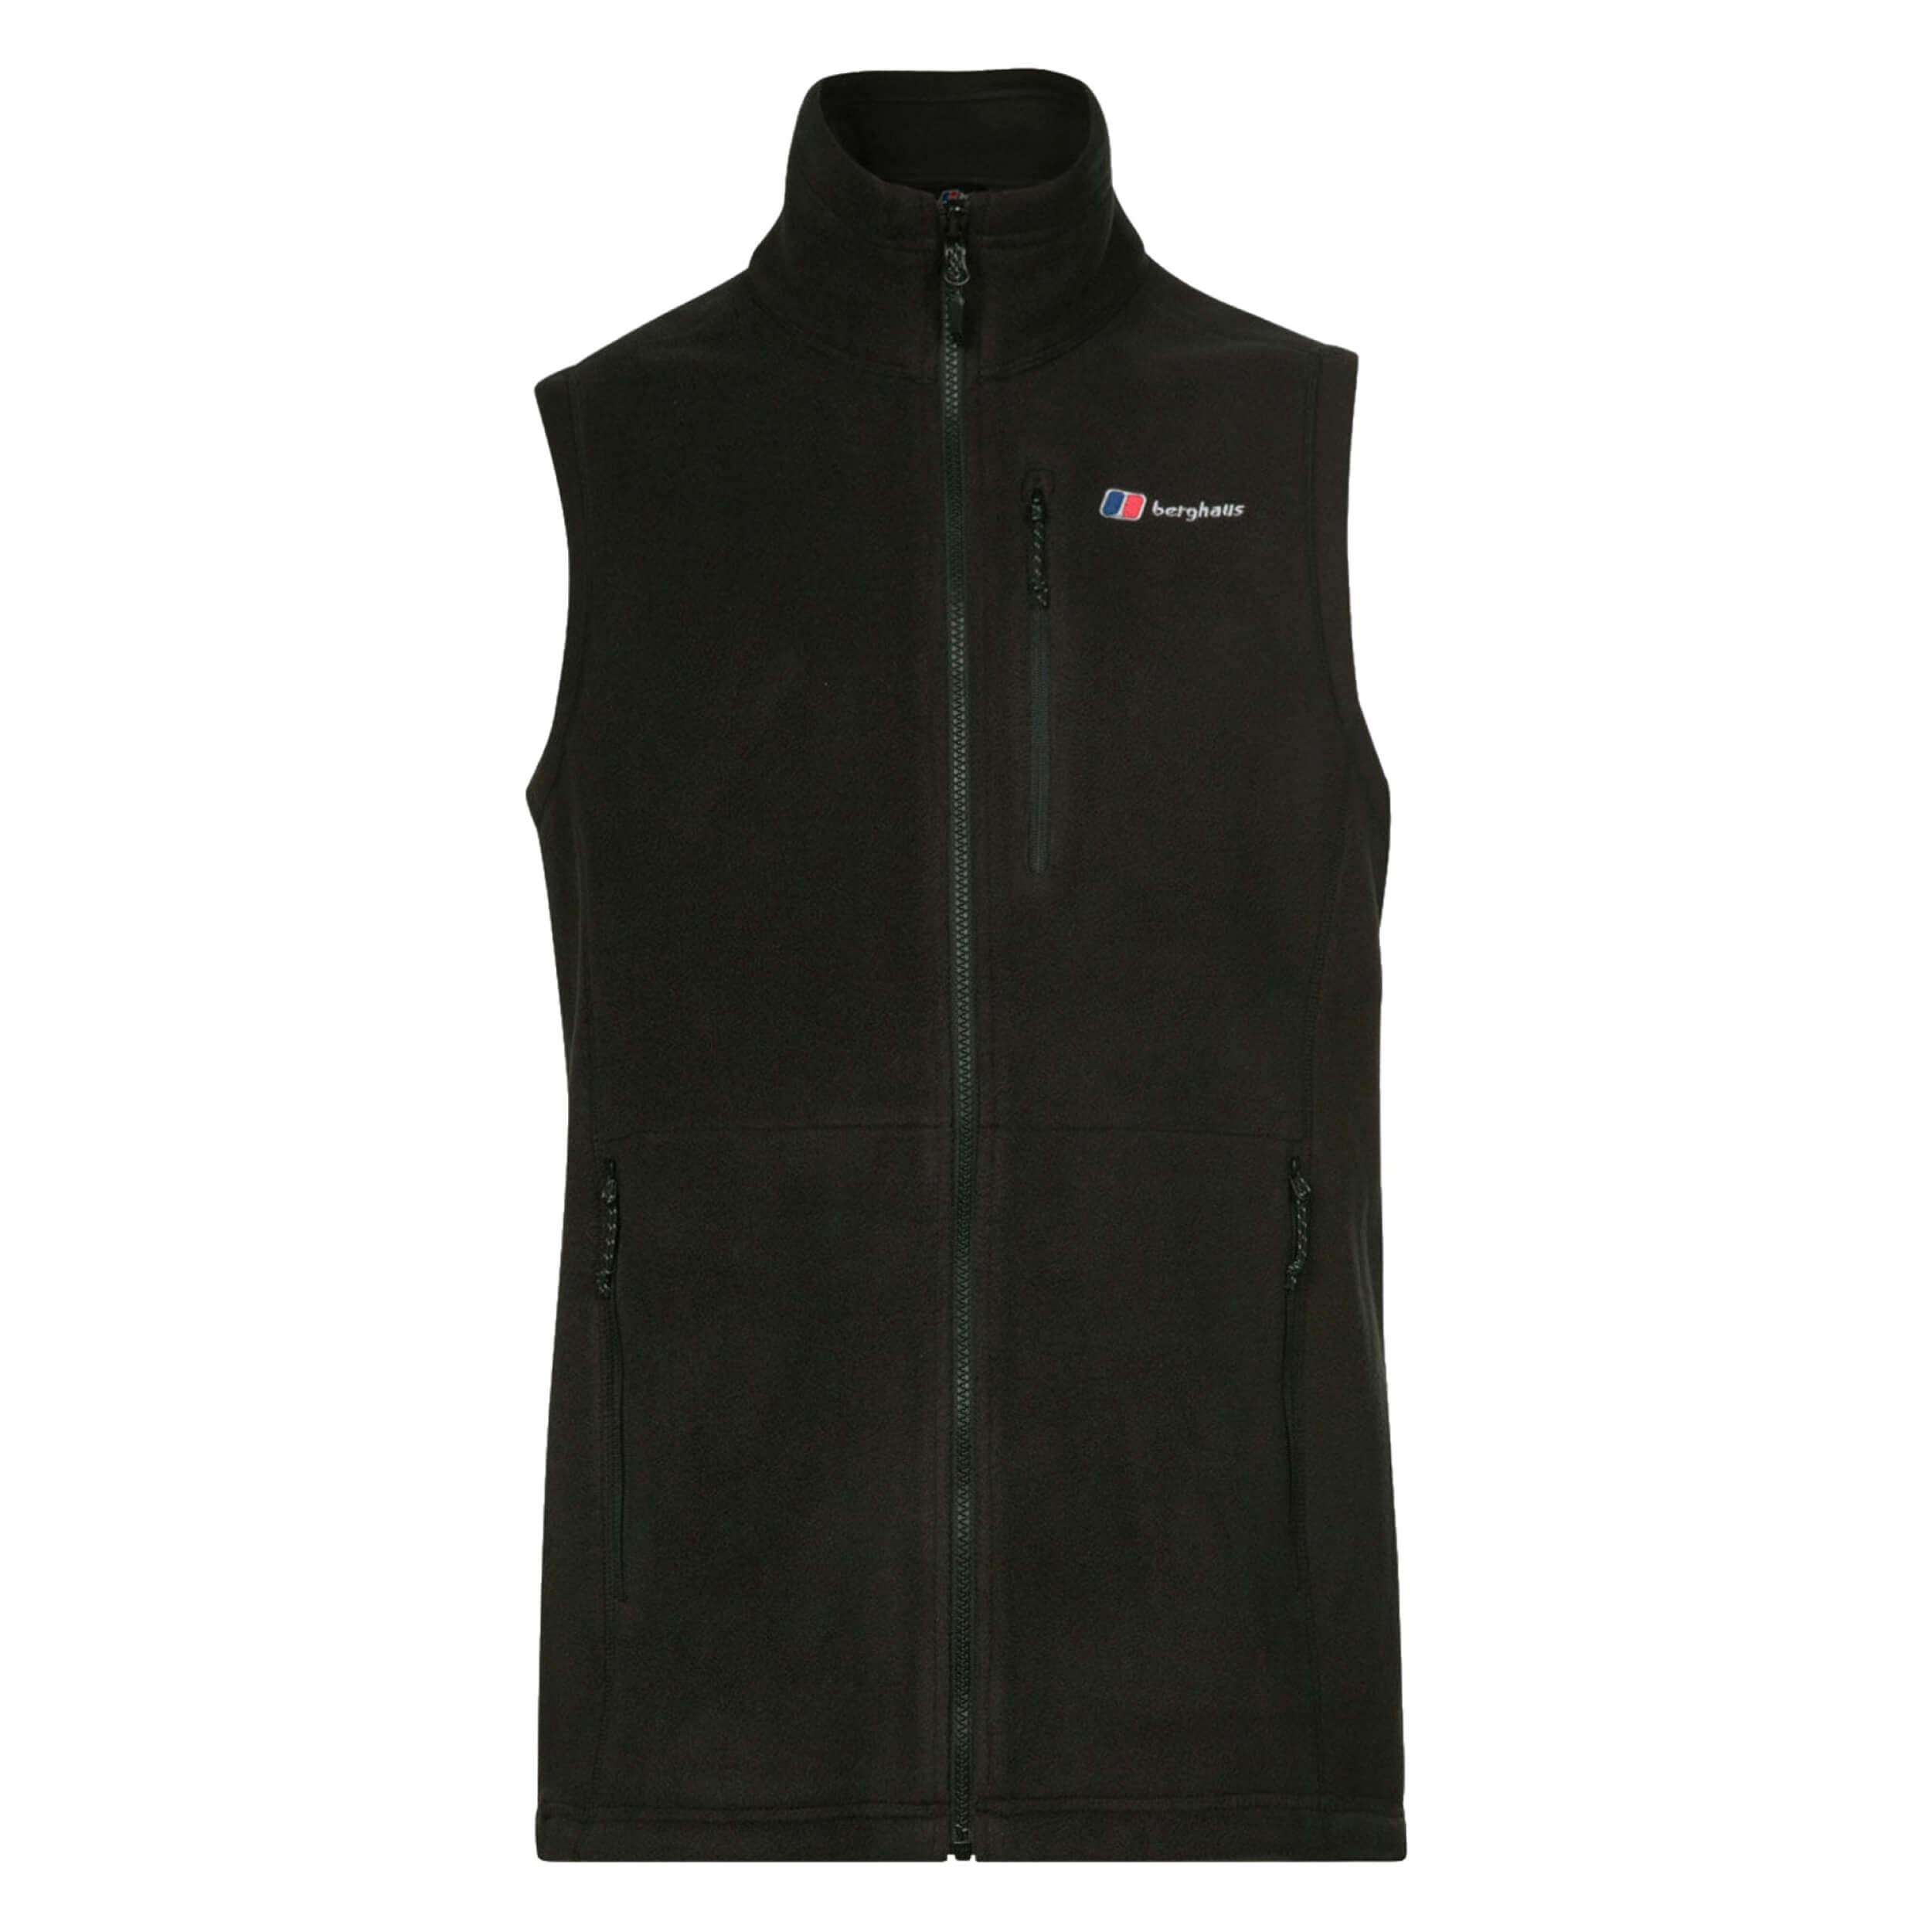 Berghaus Prism PT InterActive Fleece Vest black